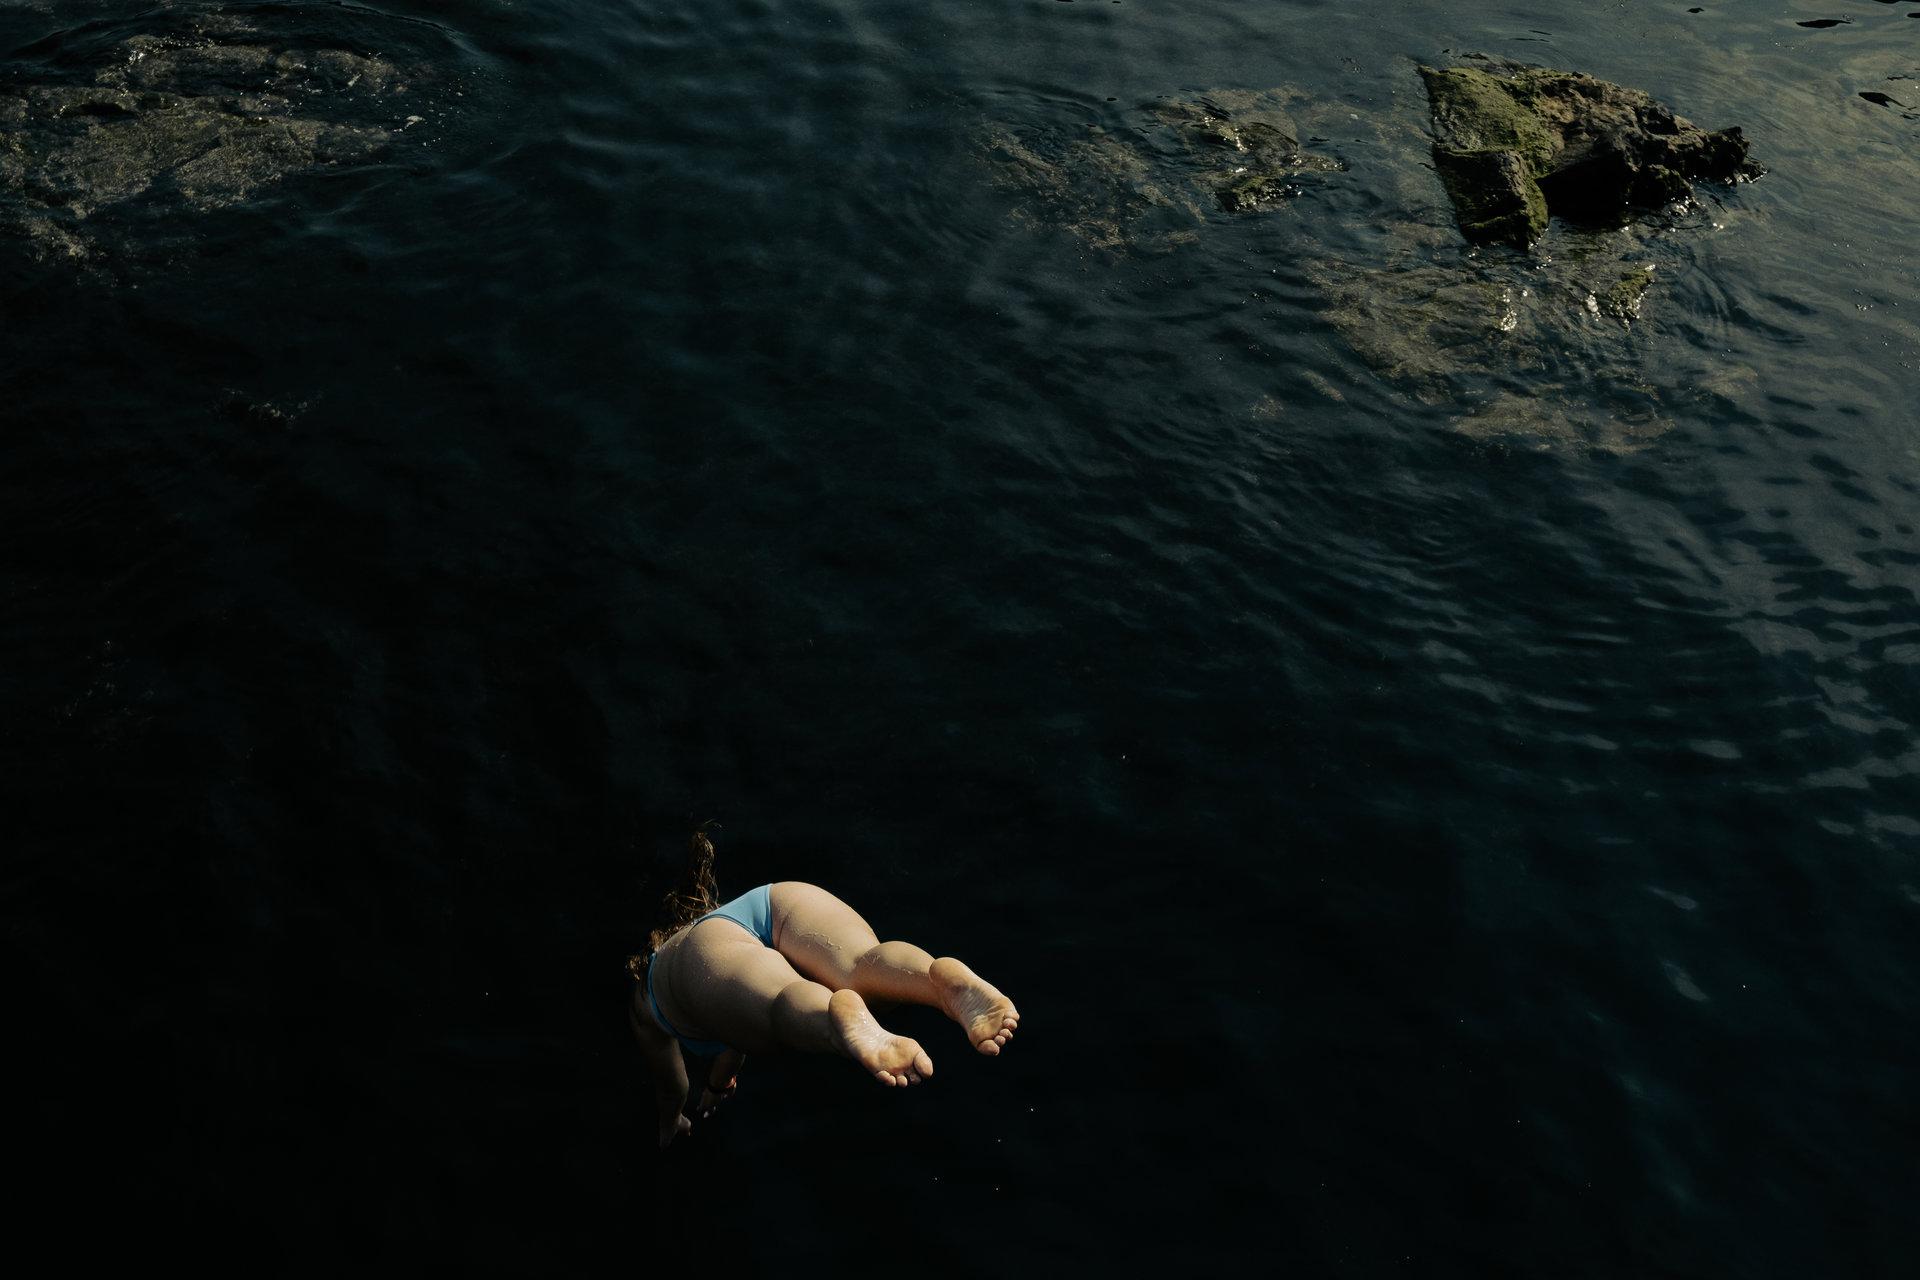 jump again   Author Viktoria Teneva - ohwhatalifeboy   PHOTO FORUM